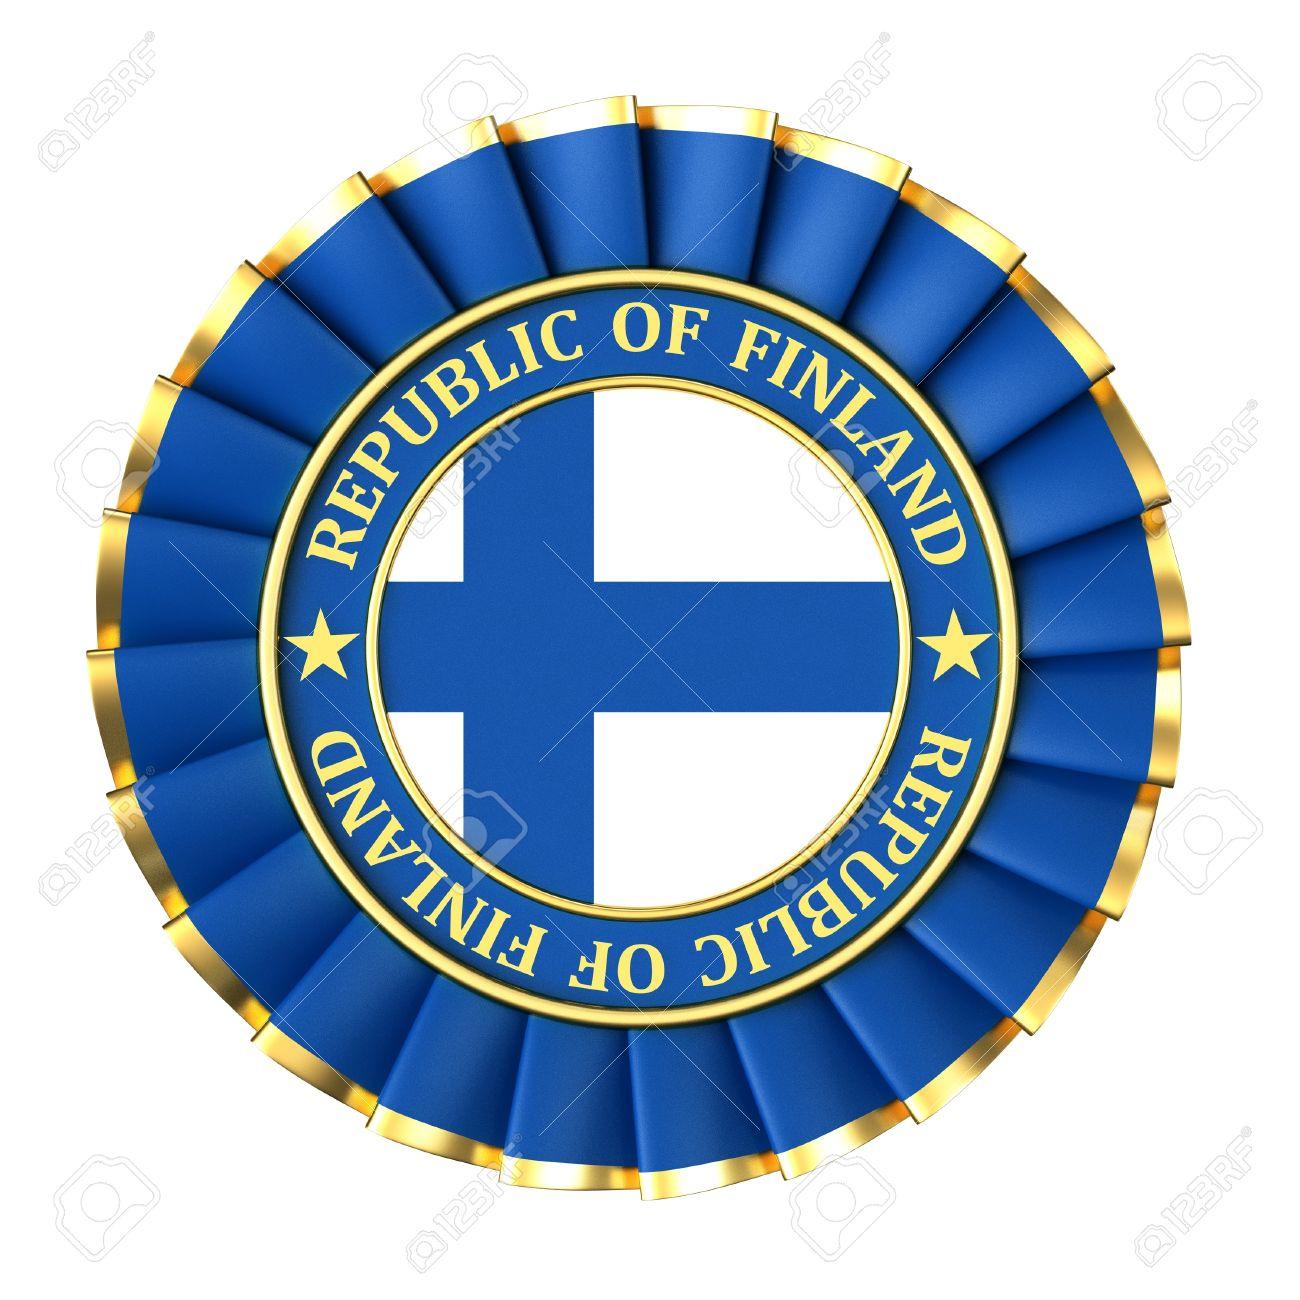 Ribbon Award With The Symbols Of Republic Of Finland Stock Photo.